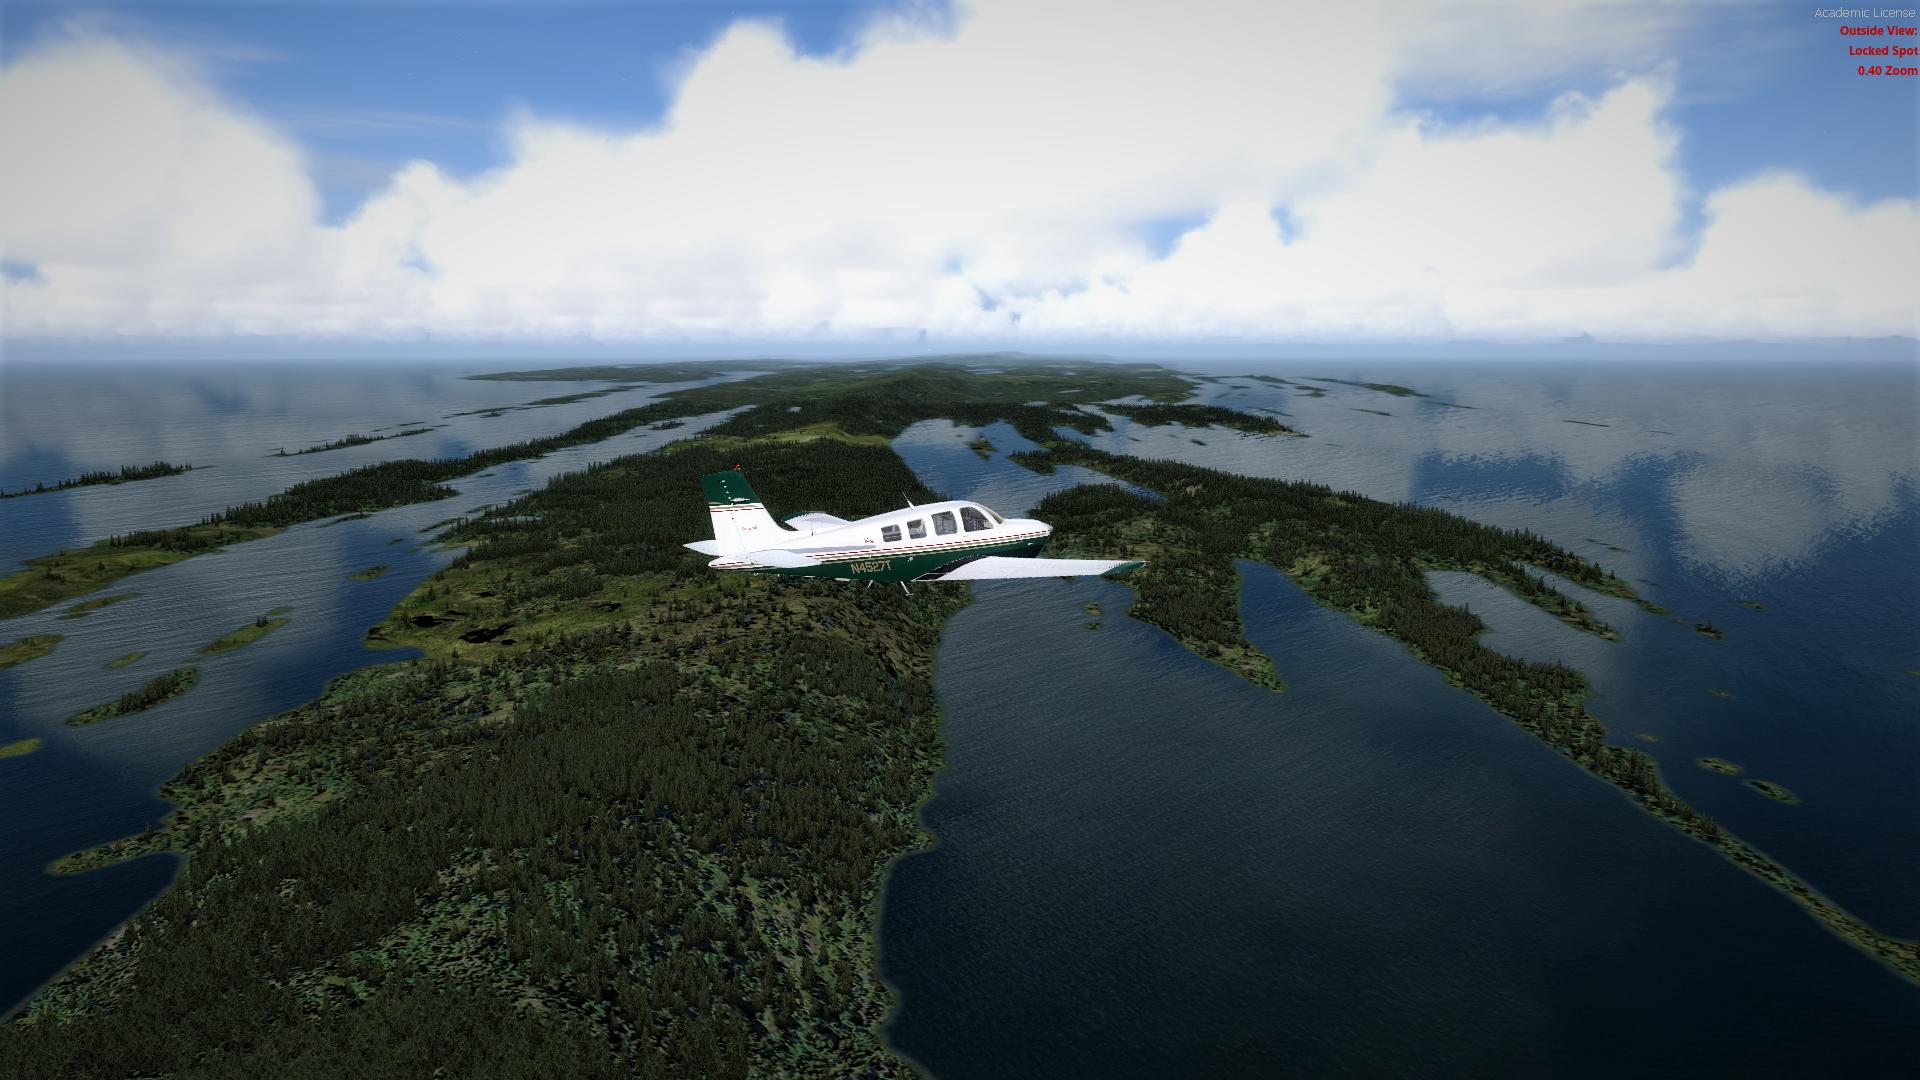 Morning flight over Isle Royale National Park flightsim 1920x1080